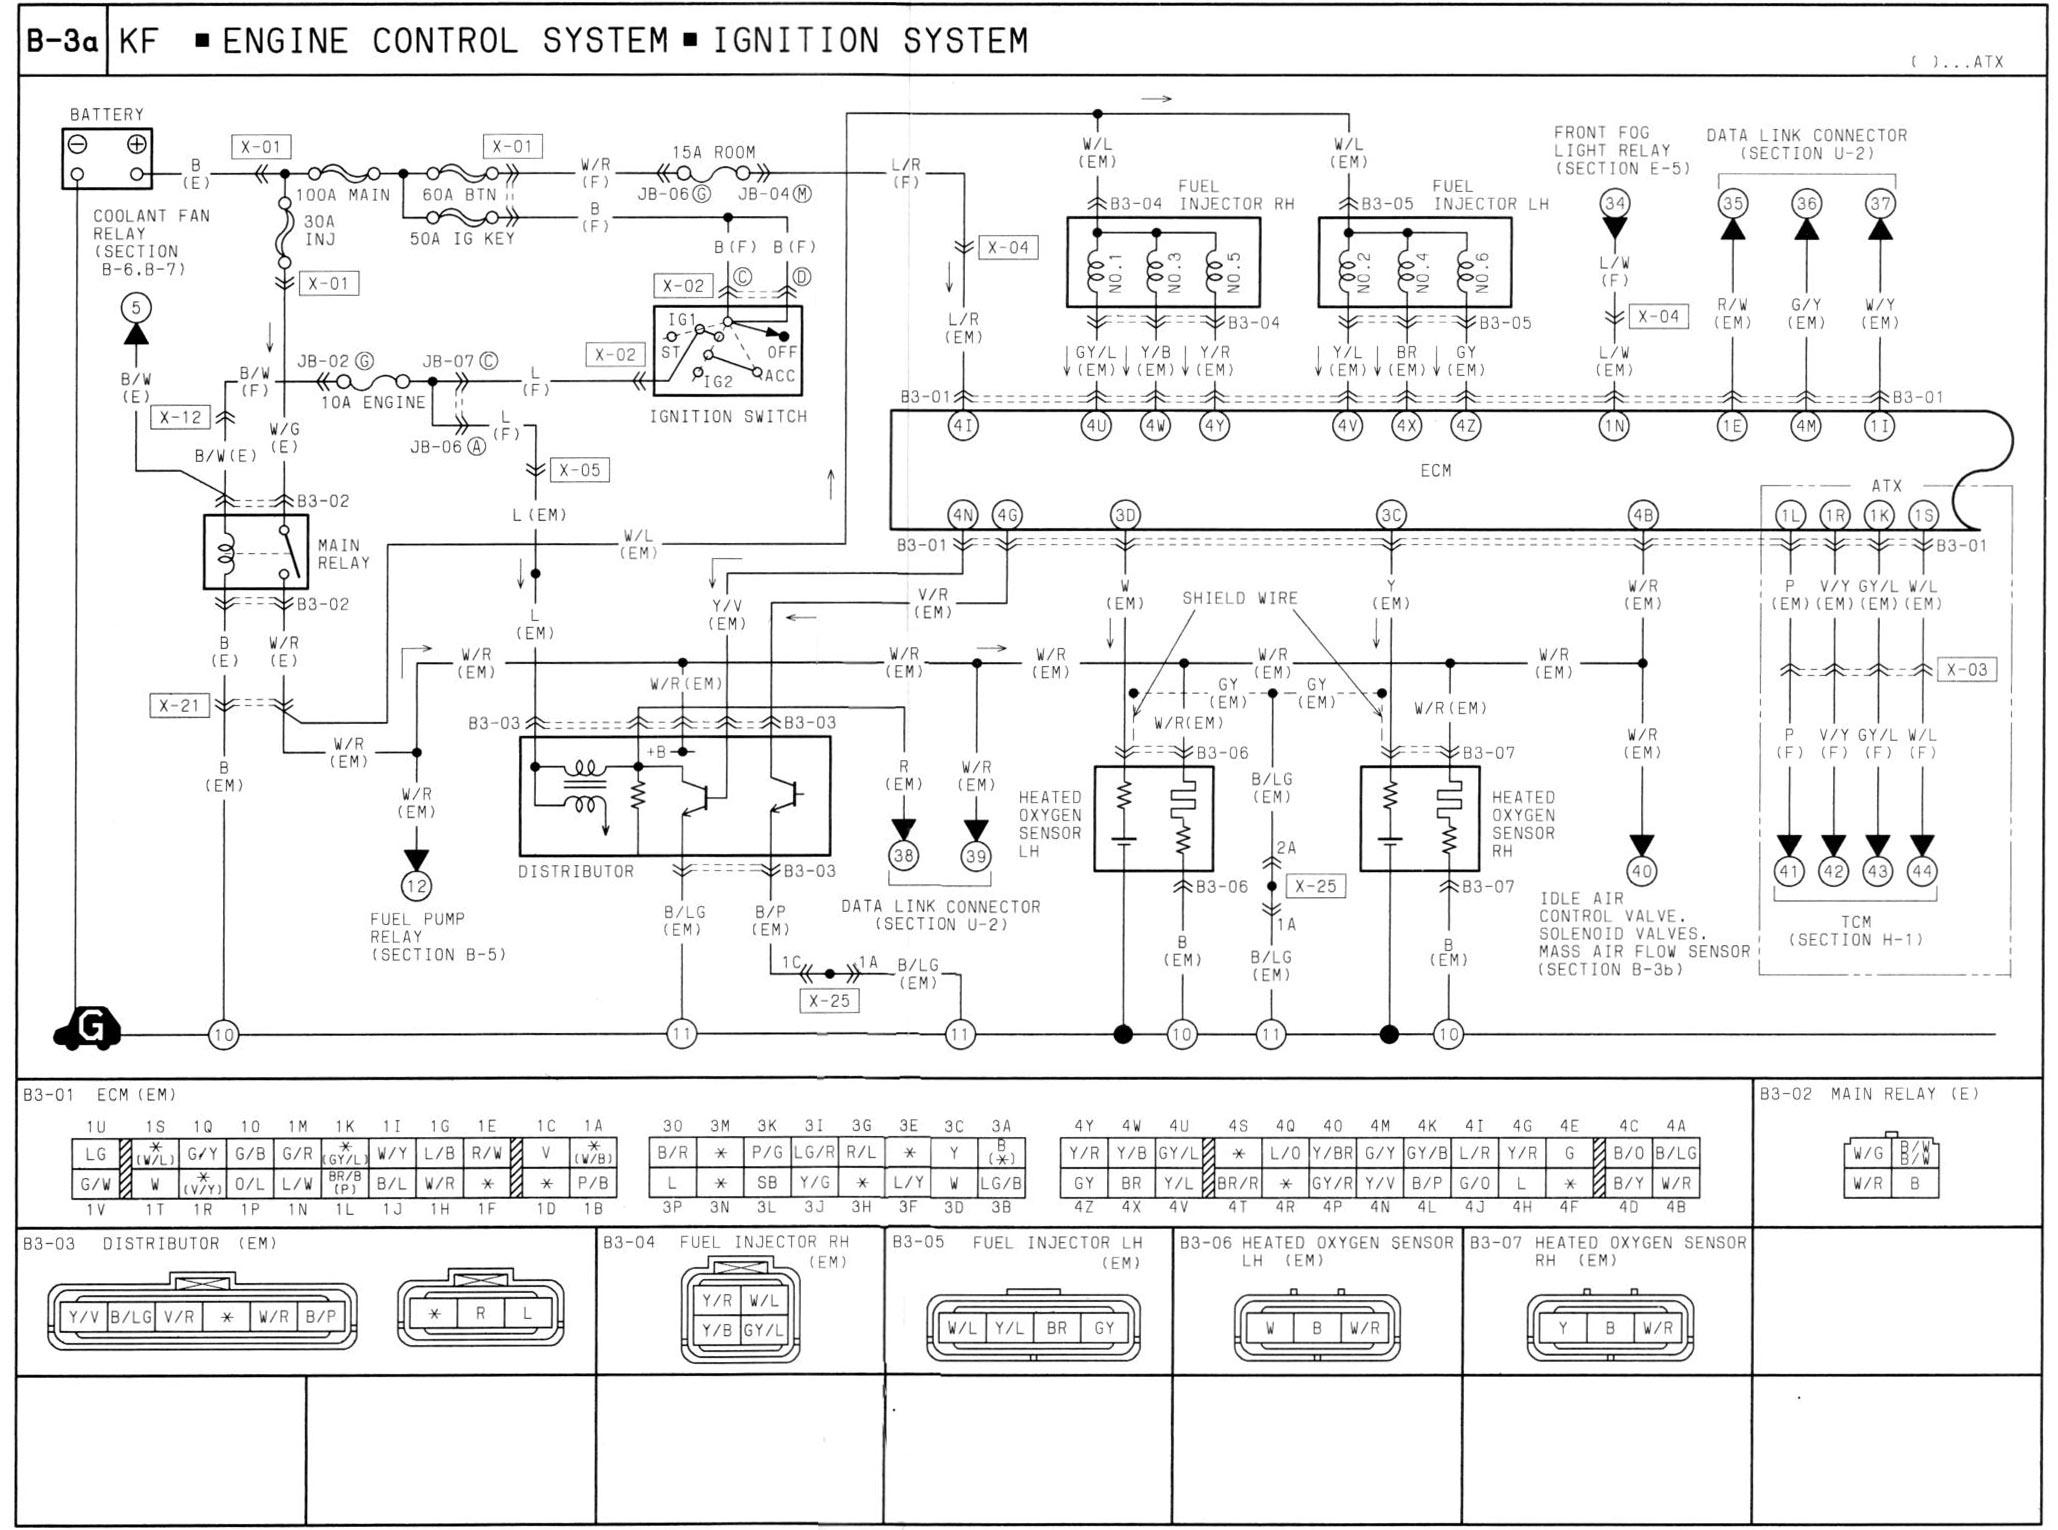 wiring diagram ford laser 1990 fw 0661  1989 mazda 323 engine fuse box diagram  1989 mazda 323 engine fuse box diagram